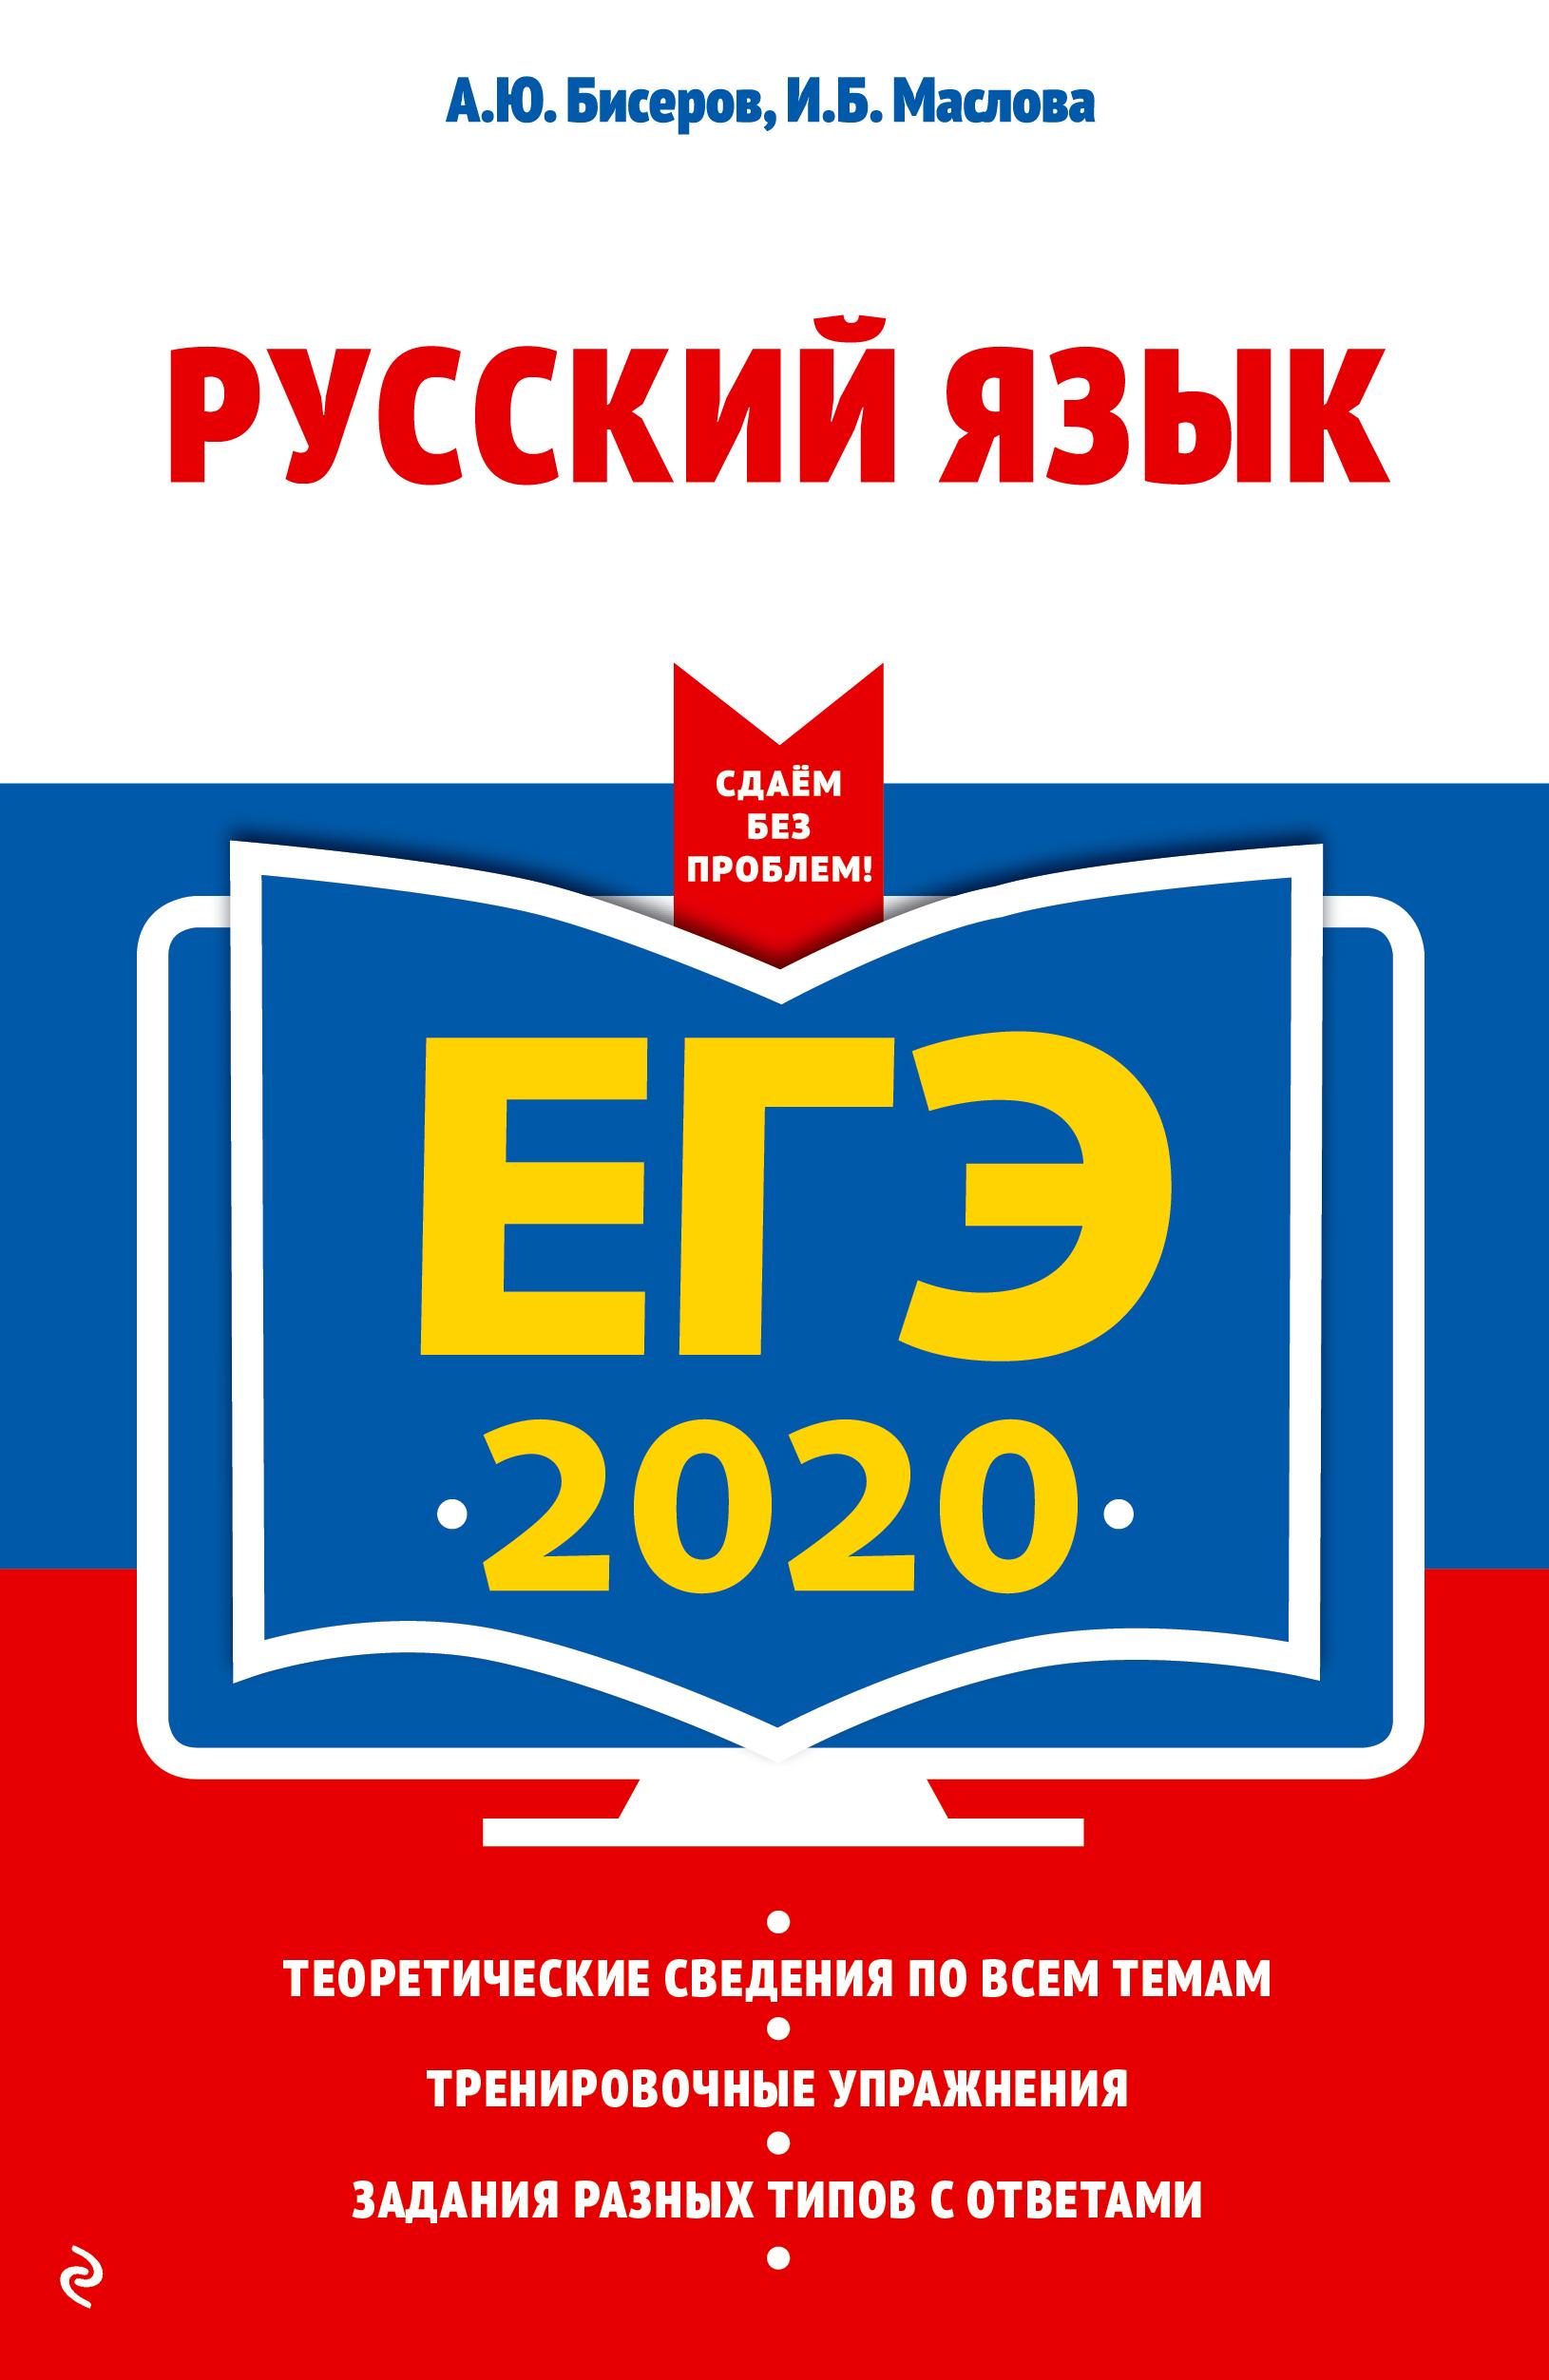 EGE-2020. Russkij jazyk